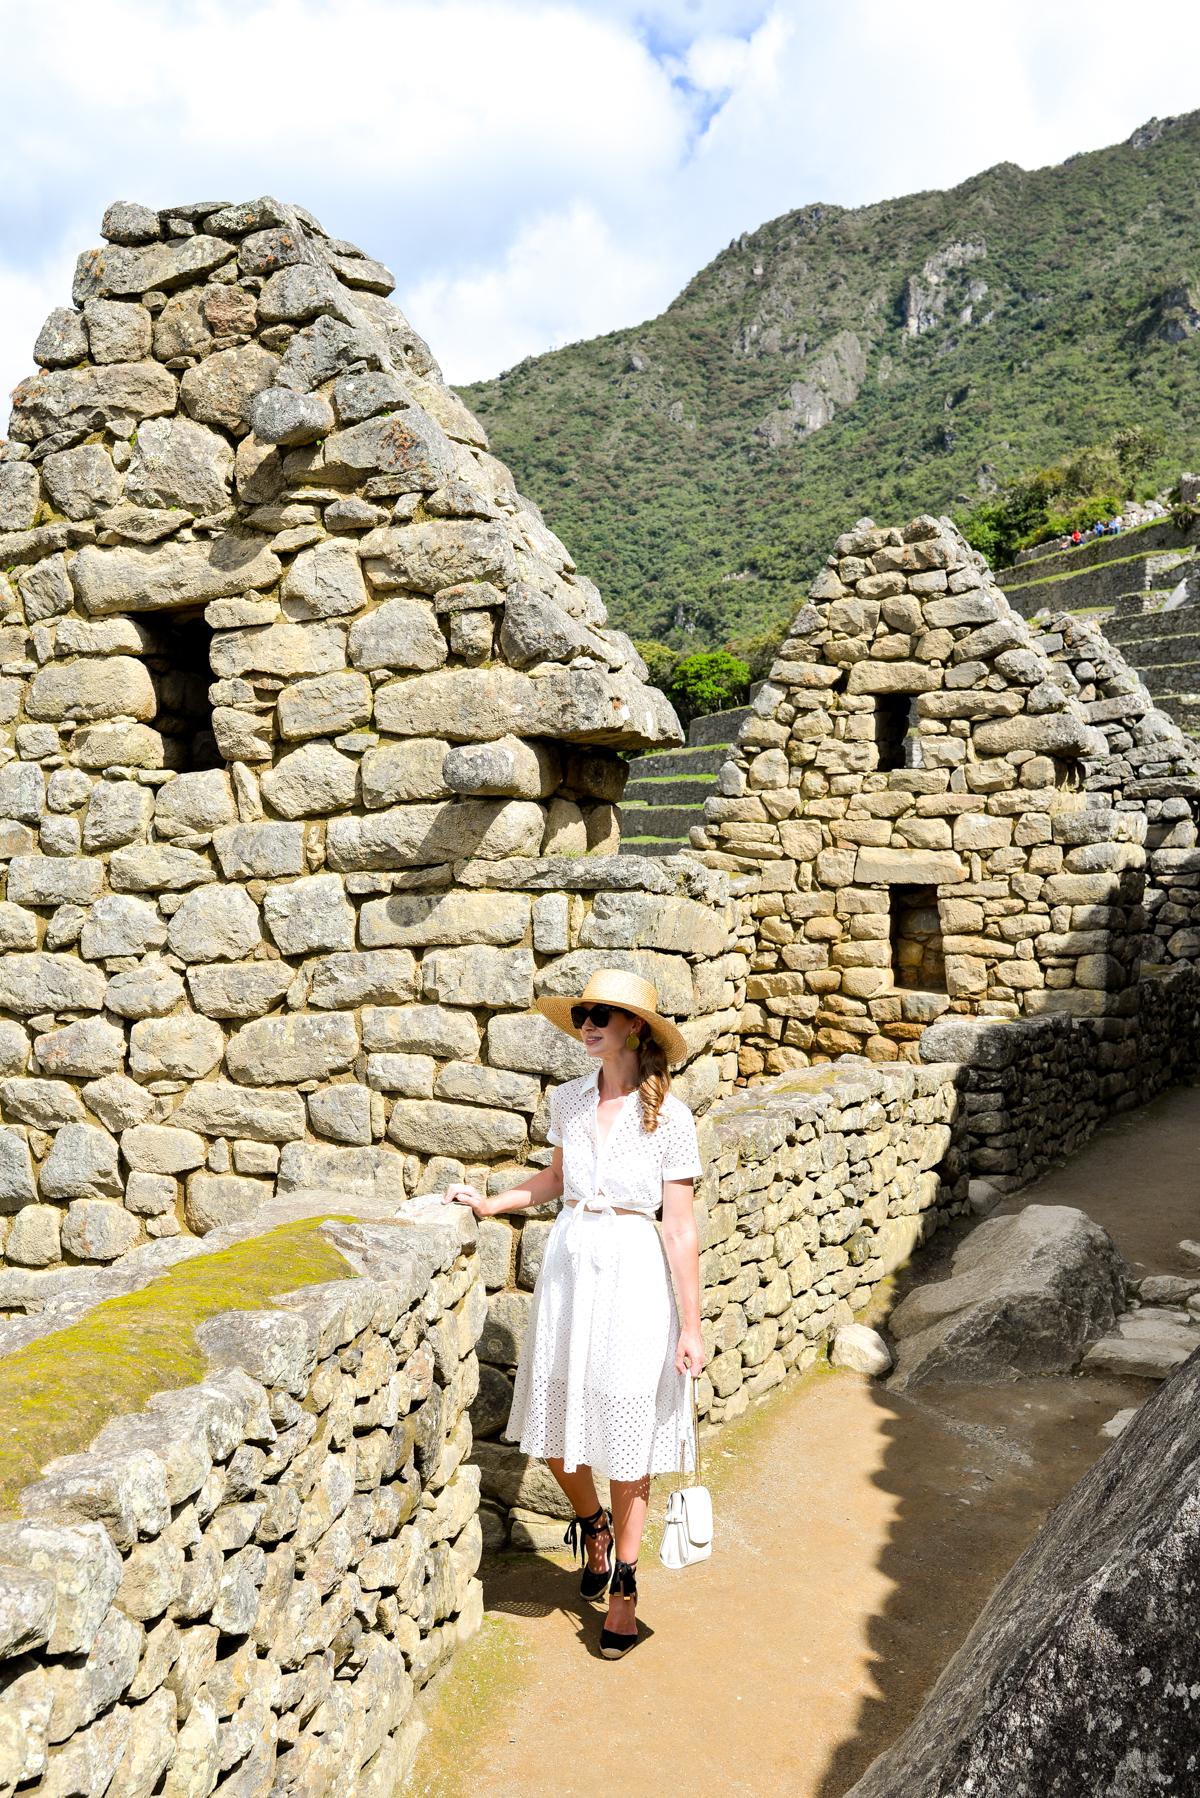 Stacie Flinner x Belmond Machu Picchu Peru-5